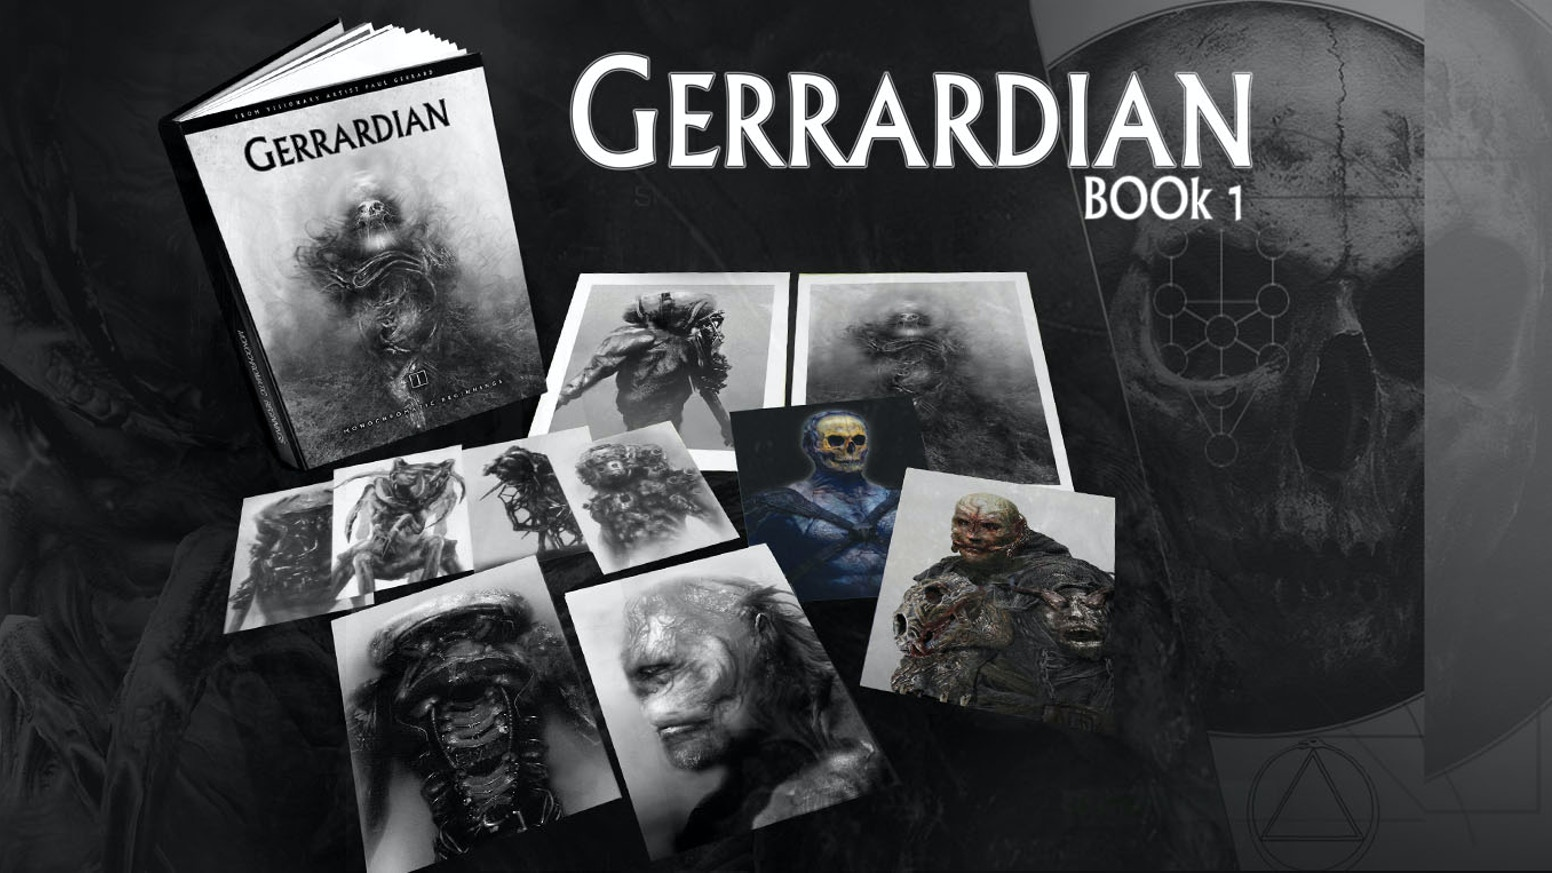 A glorious hardback book showcasing Gerrard's most personal and intense dark art.  Hellboy / Battle La / Shannara movie artist.